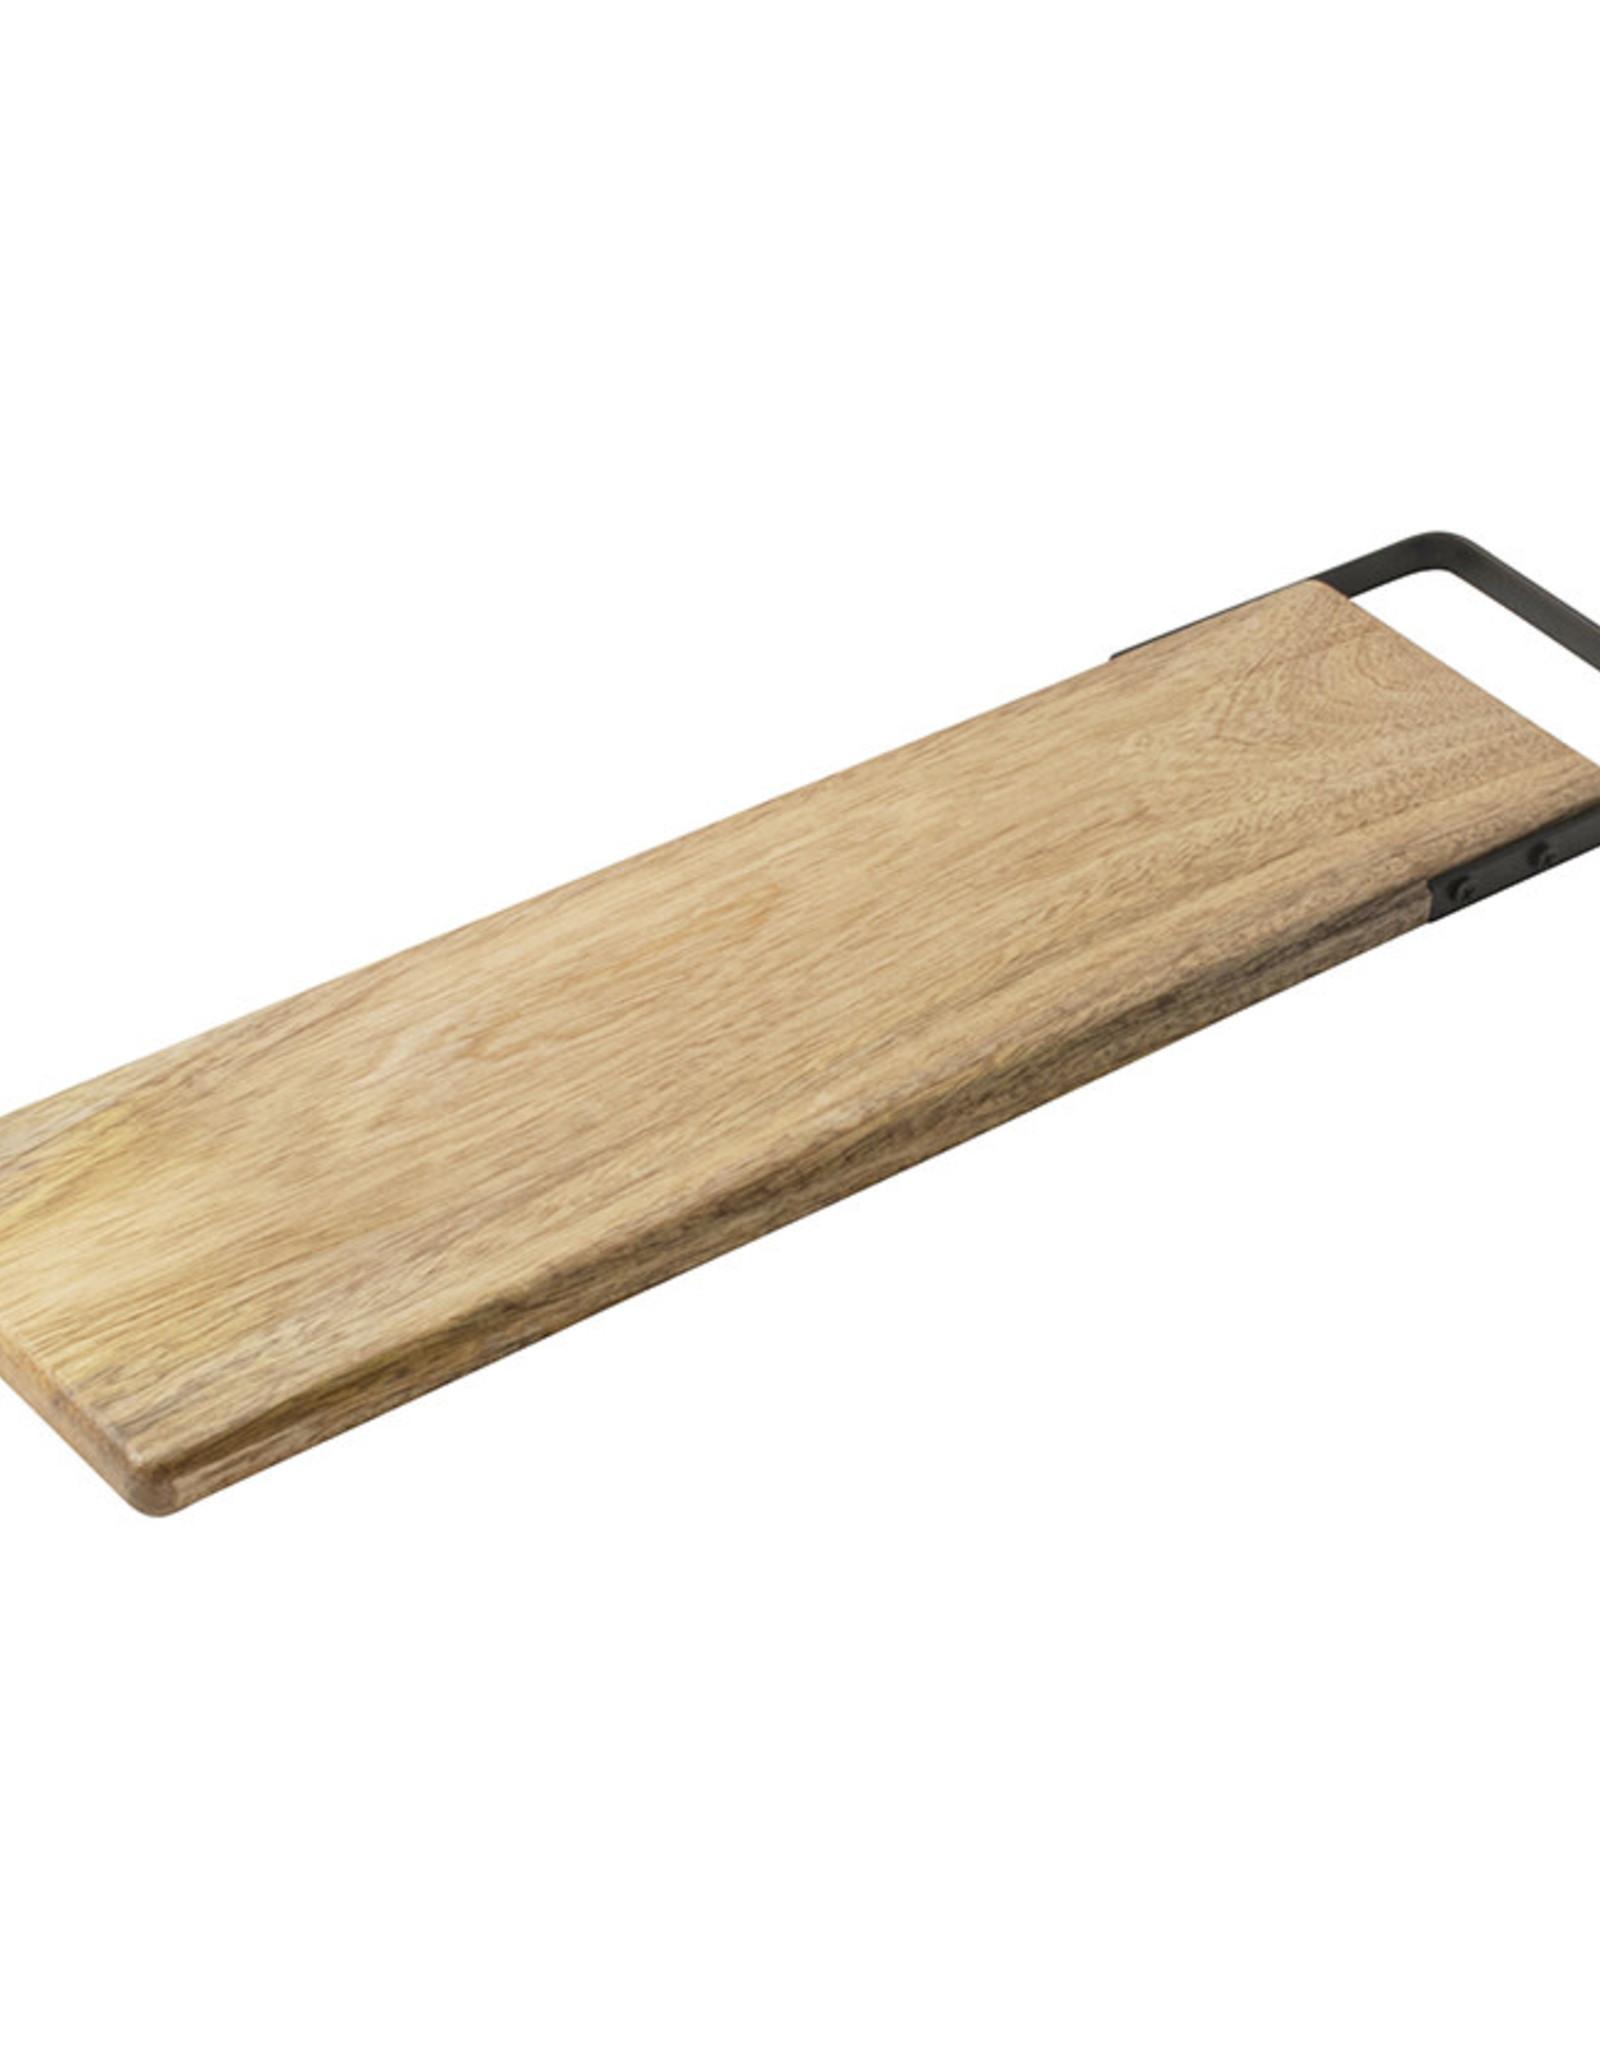 Serveerplank met handvat 50x13cm-mango wood/black